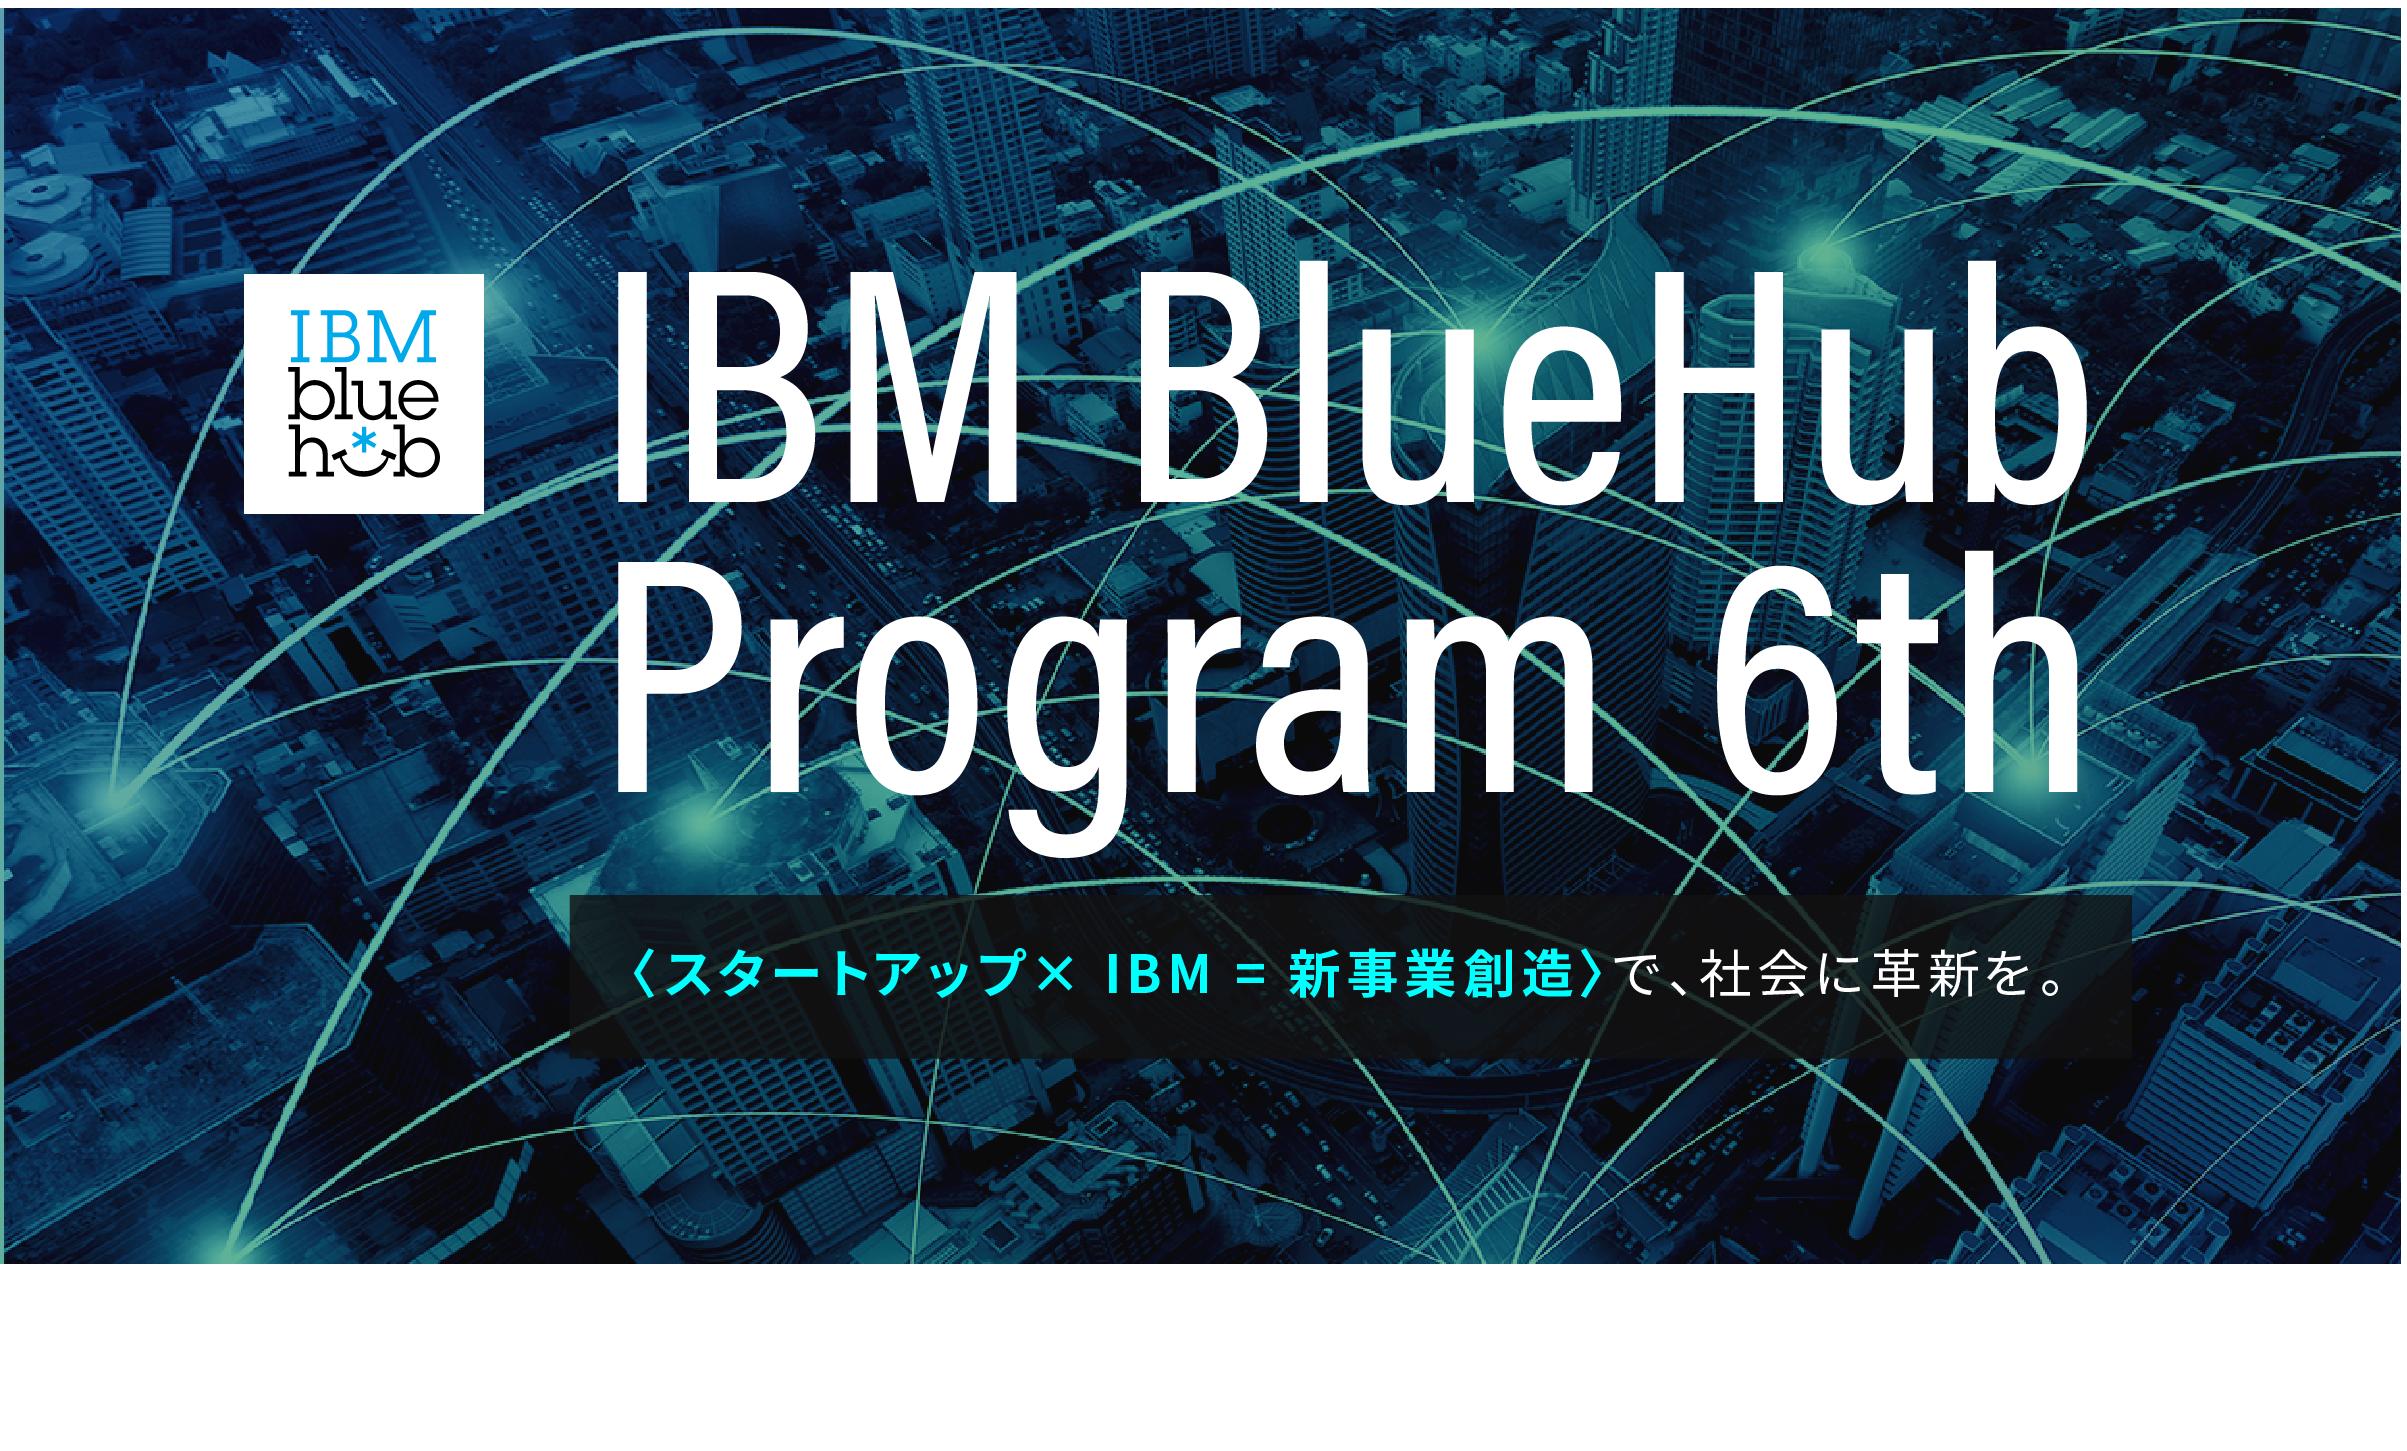 【8/6説明会】IBM BlueHub Program 6th